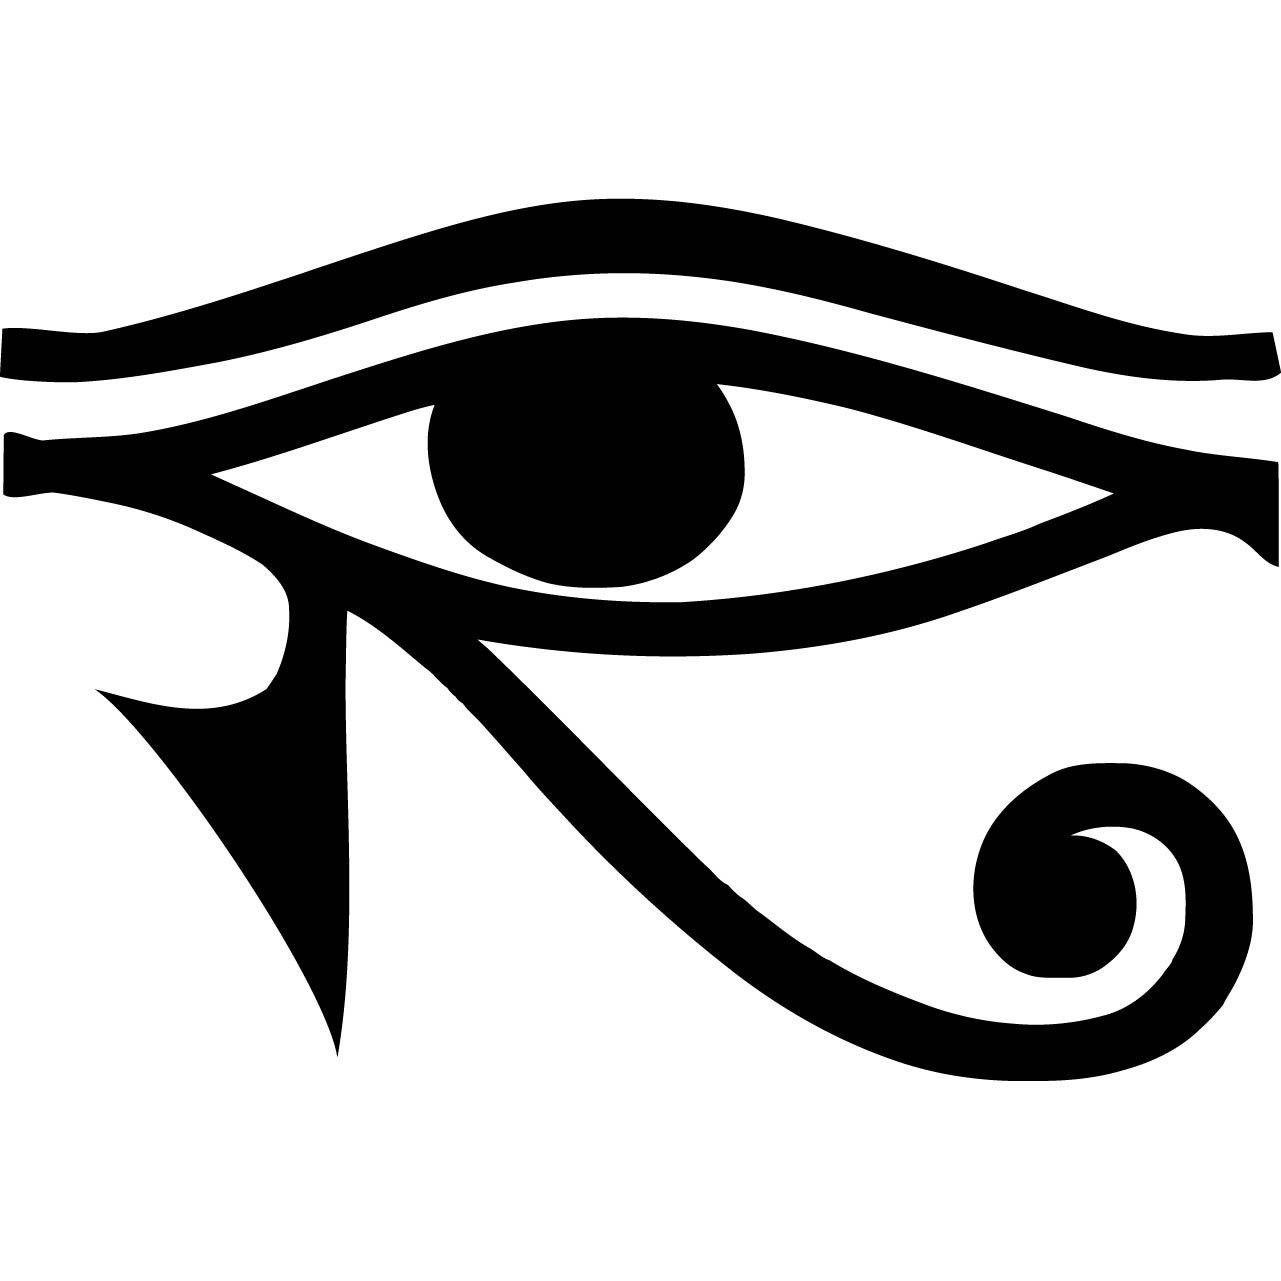 Eye of horus die cut decal car window wall bumper phone laptop eye of horus die cut decal car window wall bumper phone laptop pagan symbolsegyptian biocorpaavc